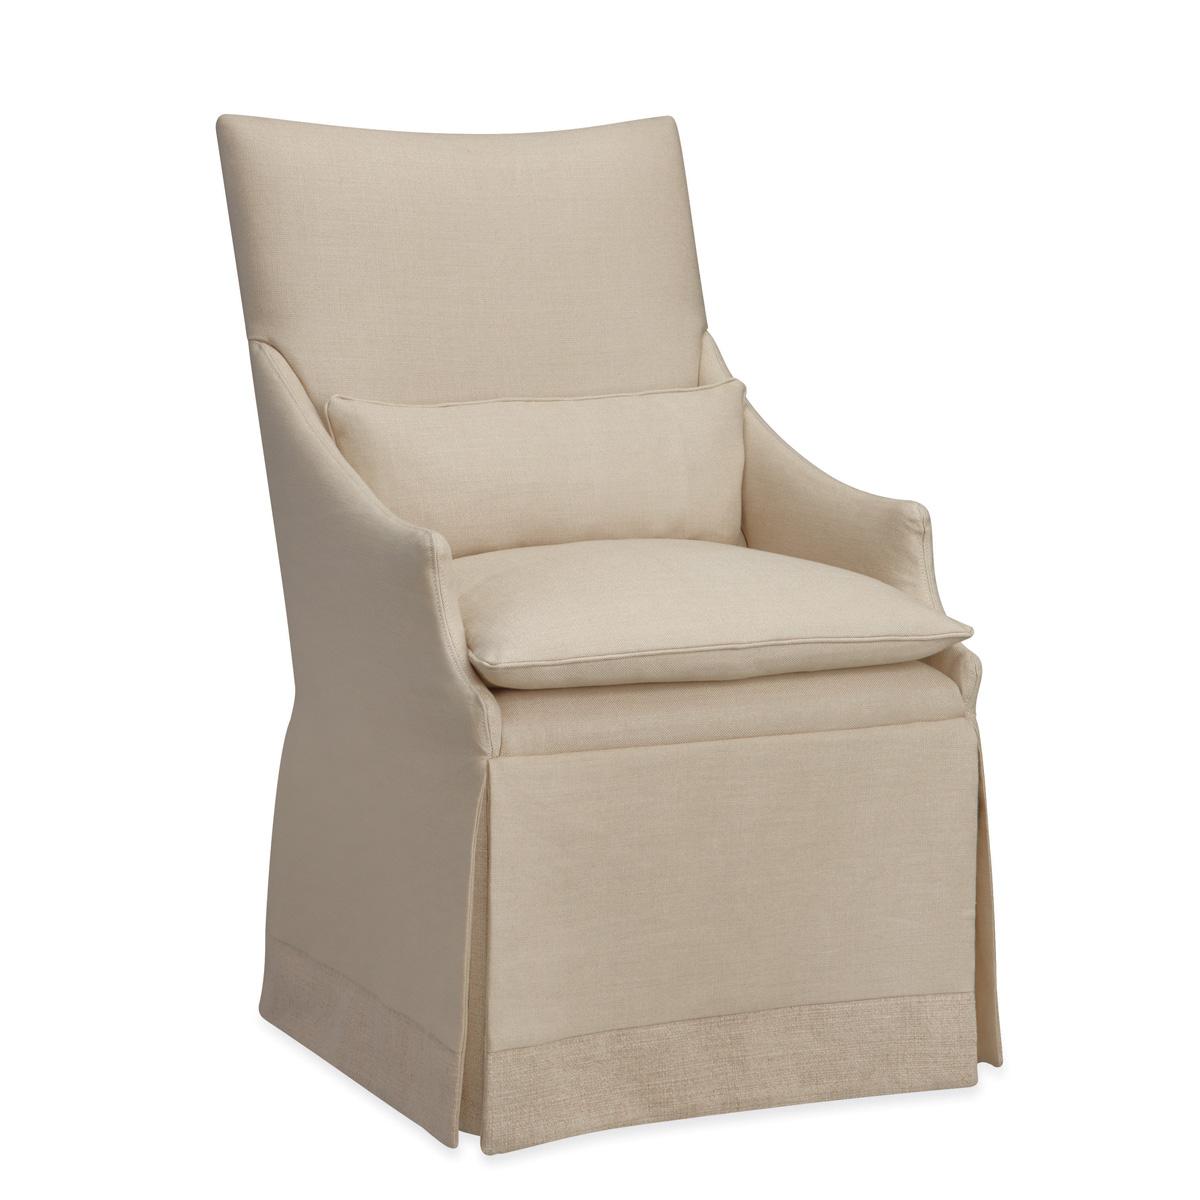 High-Back_Campaign_Chair_5202-01C_Lee_Industries.jpg